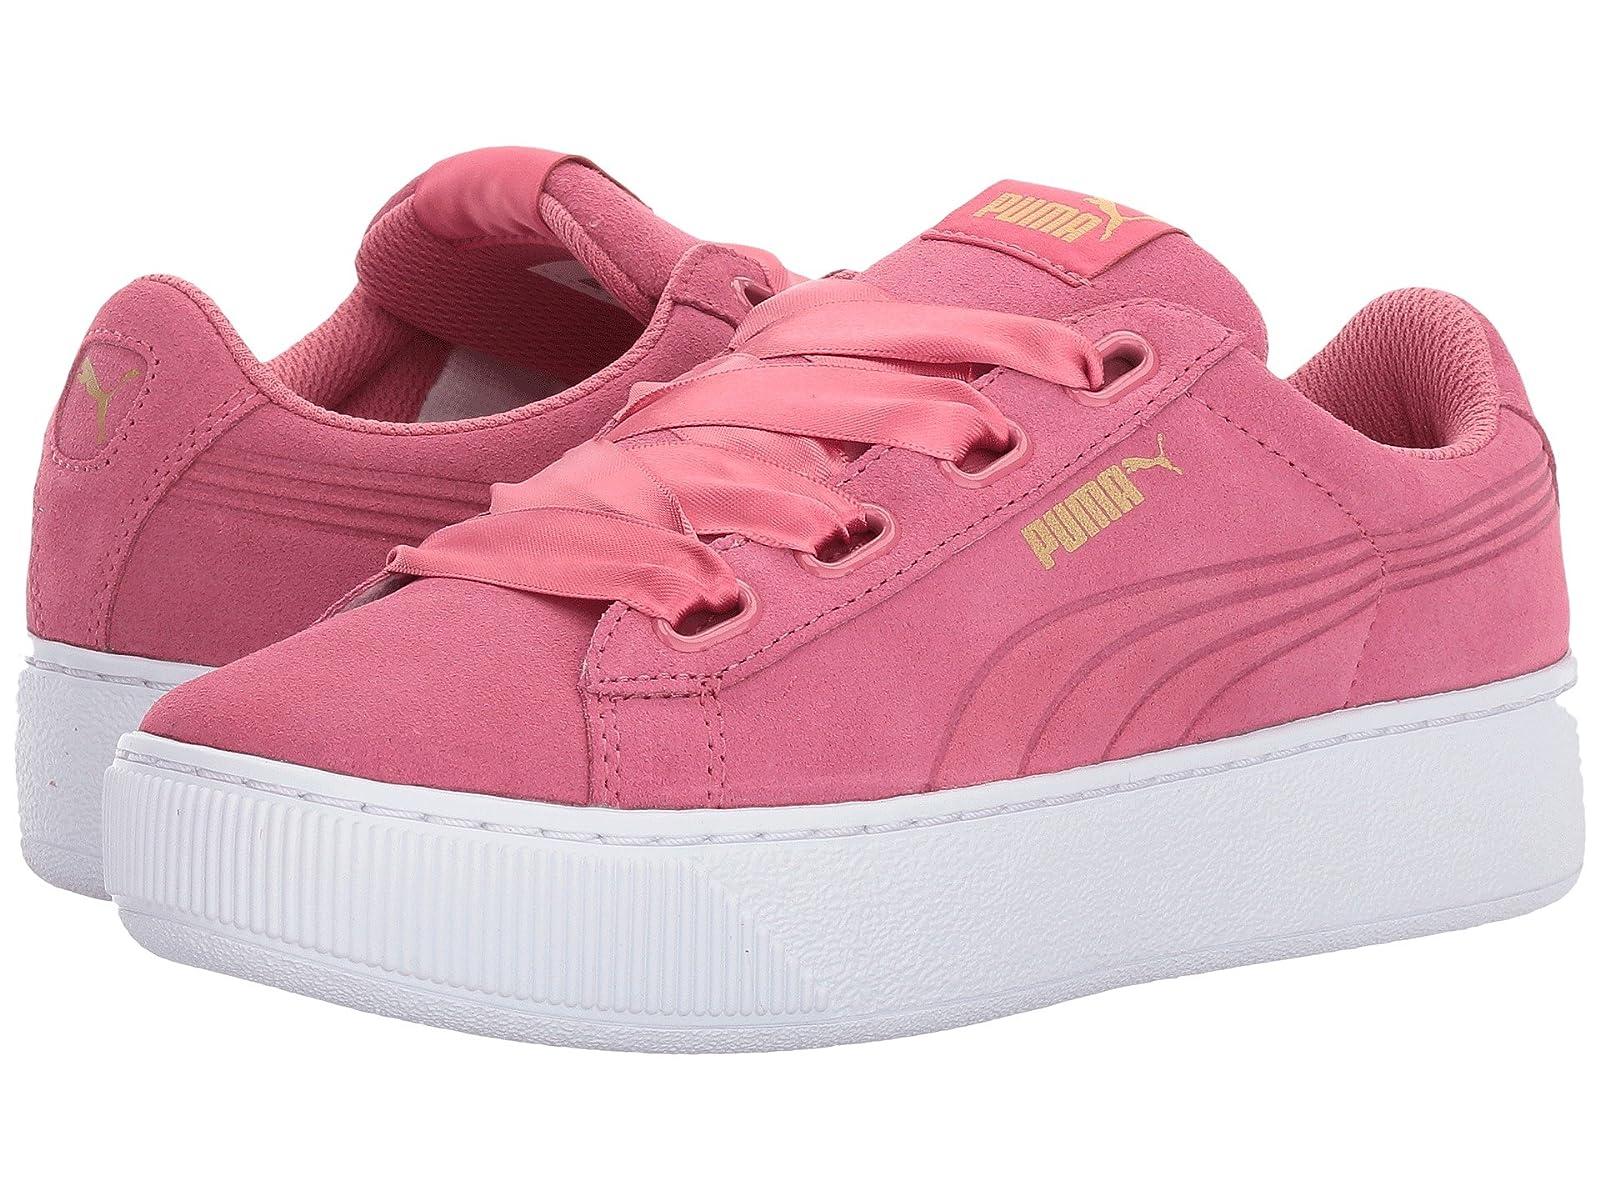 PUMA Puma Vikky Platform RibbonCheap and distinctive eye-catching shoes